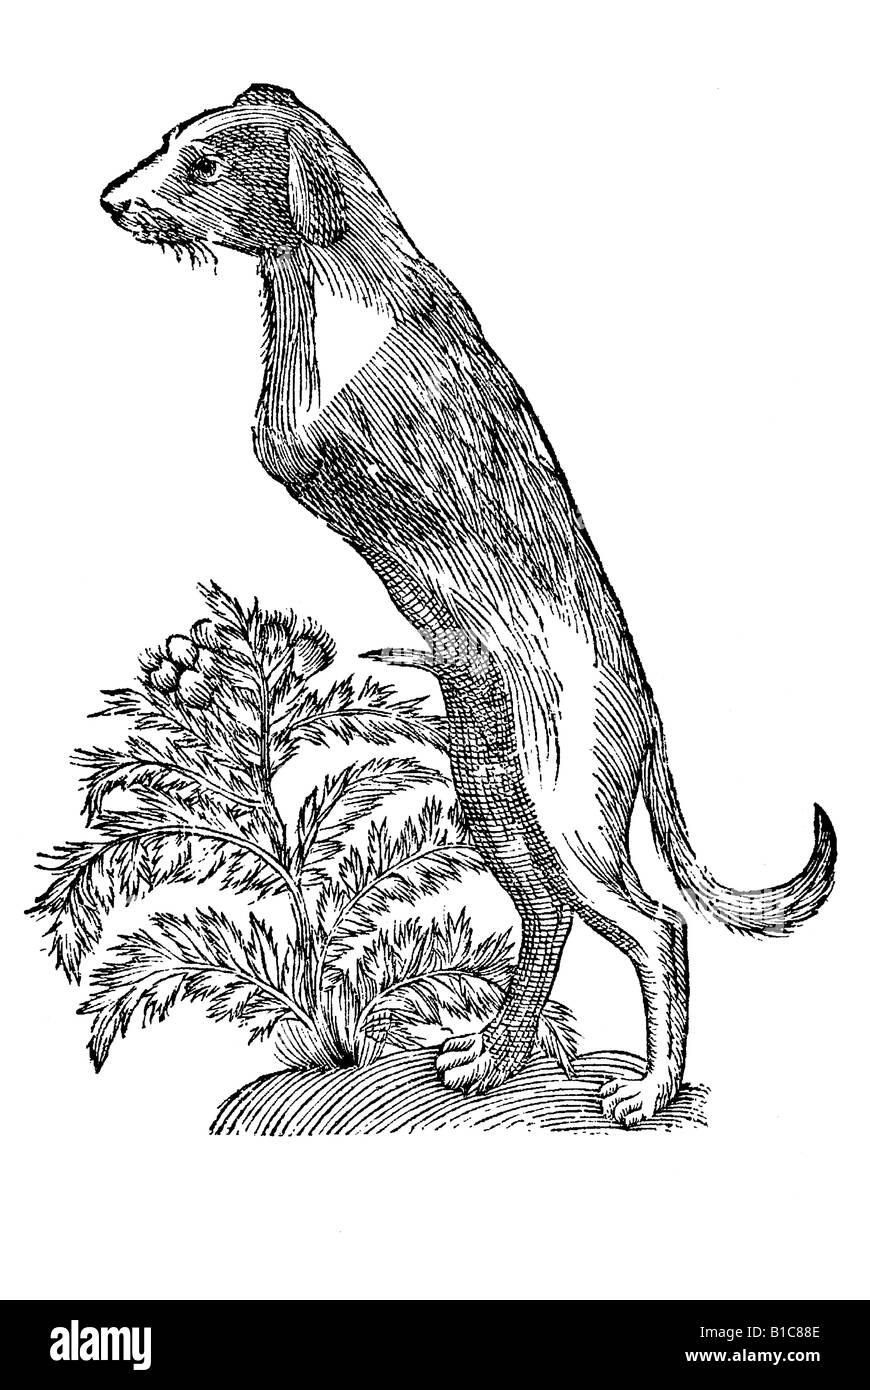 Canis bipes com Cynomazzo, Aldrovandi, 1642, siglo xvii, renacentista, Europa Foto de stock